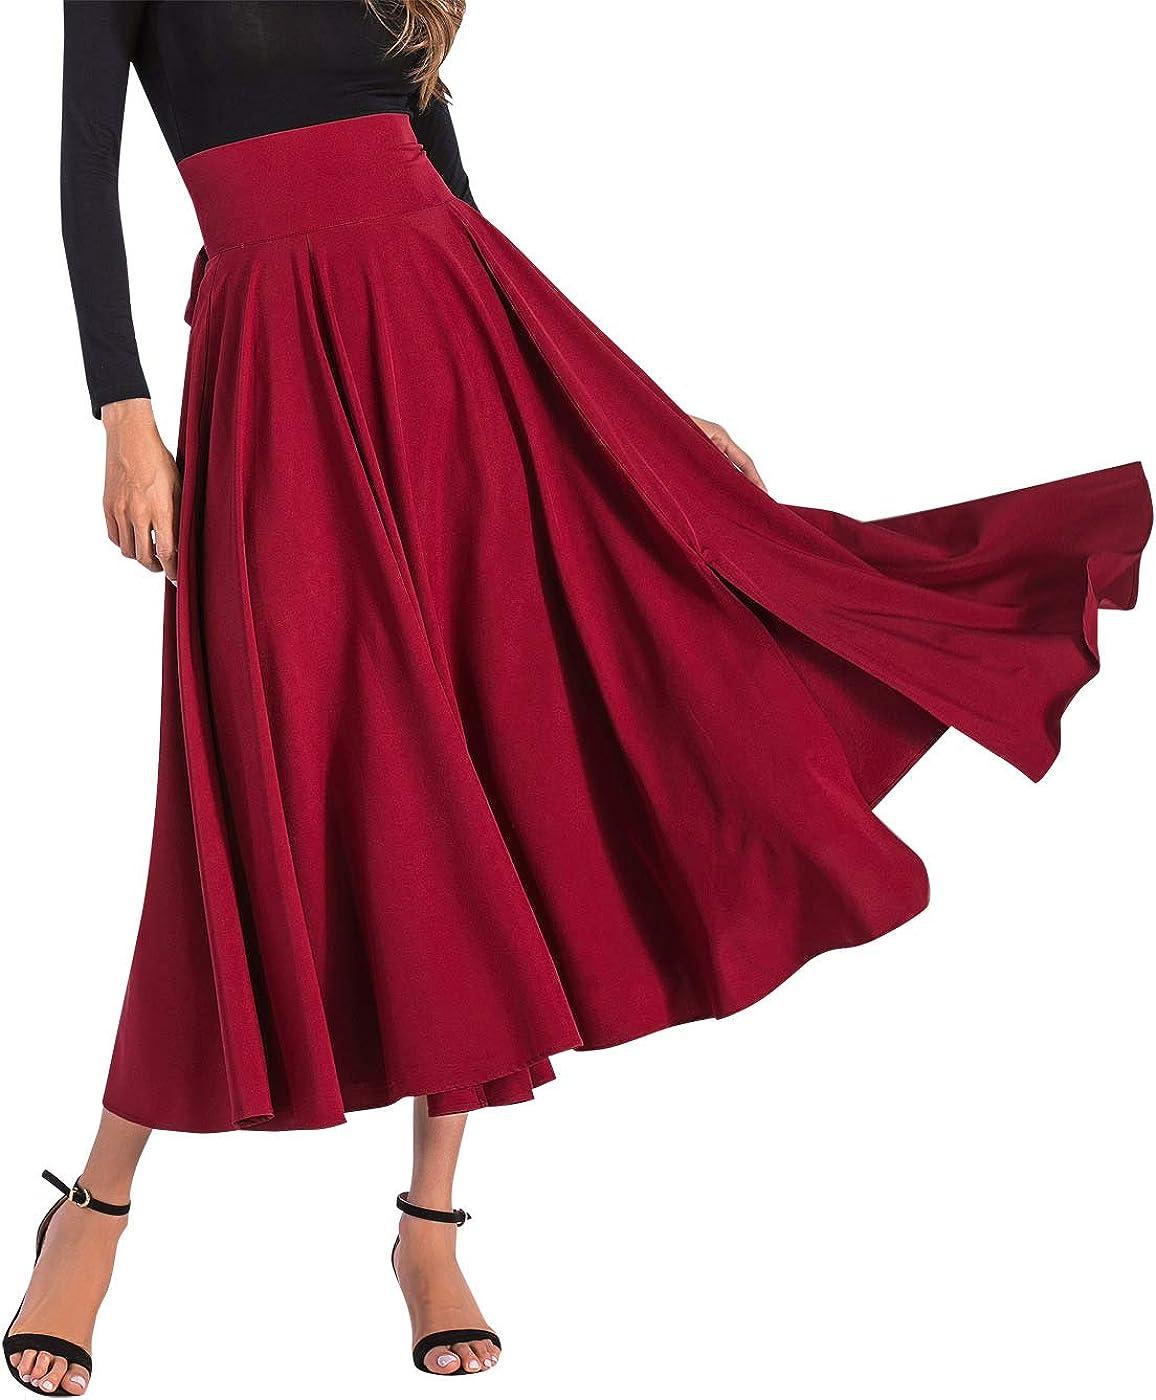 Aivtalk Women High Waist Long Skirt with Slit Pockets Bow Tie Pleated Maxi Skirt